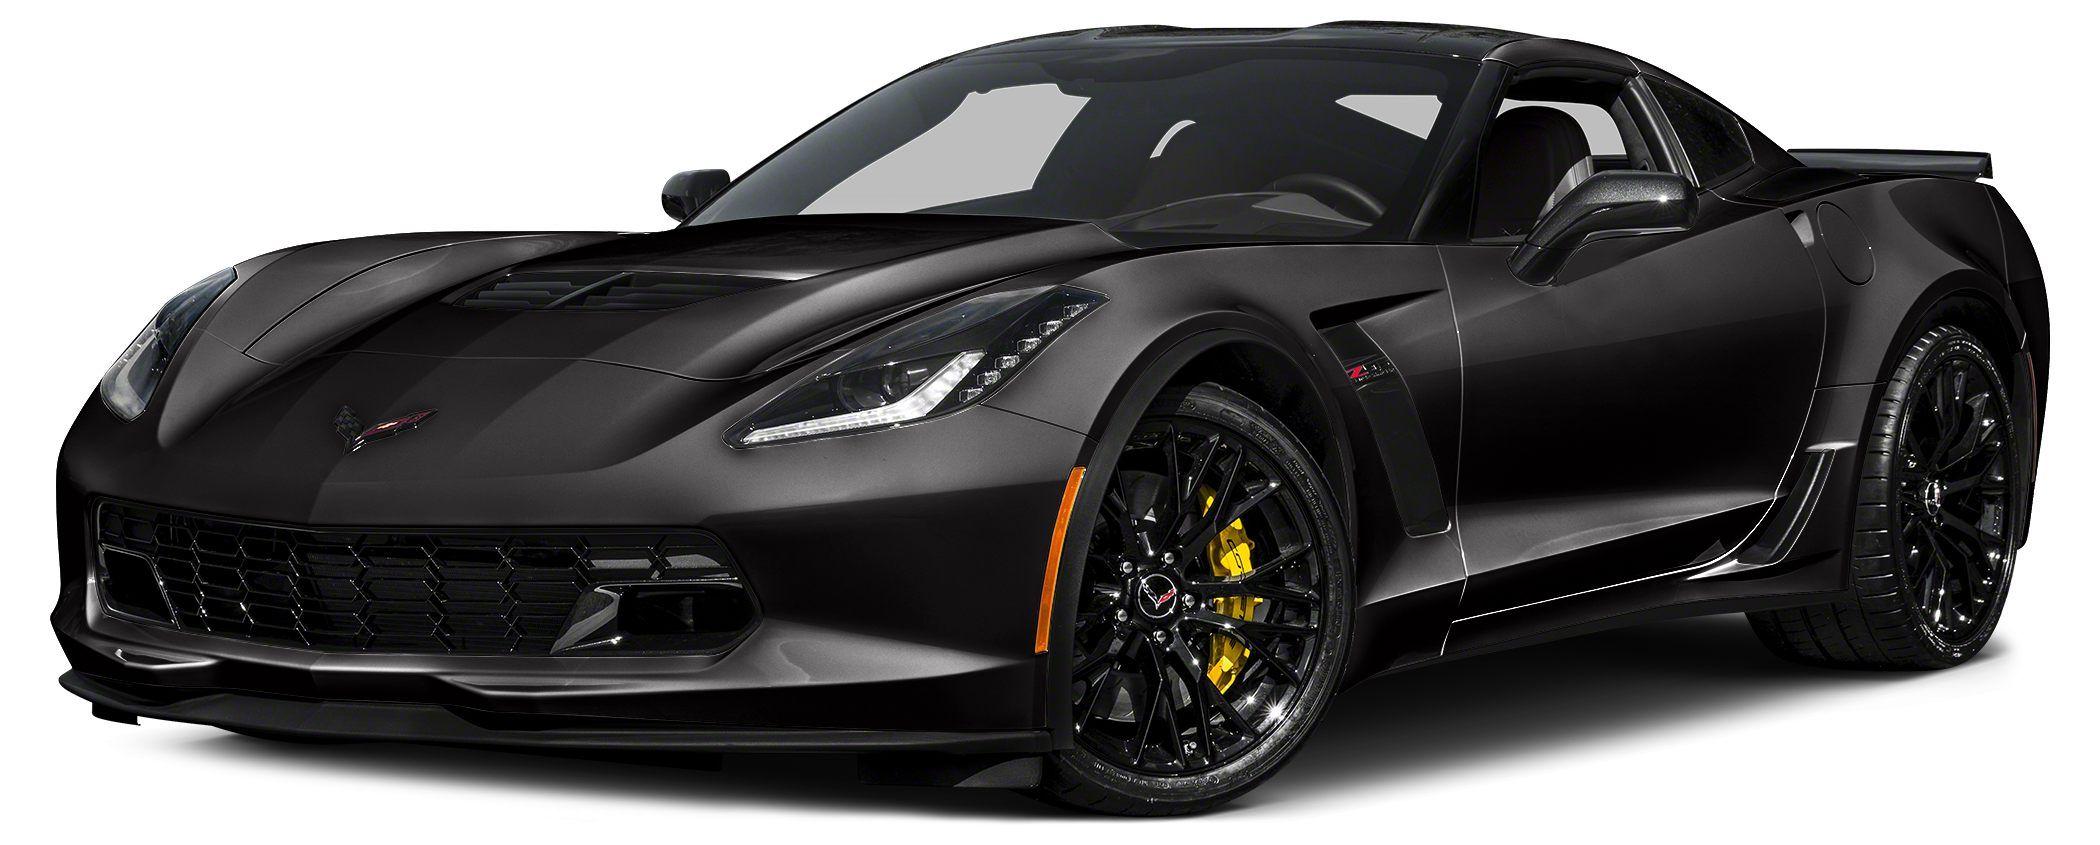 New 2018 Chevrolet Corvette Z06 for sale at McGee